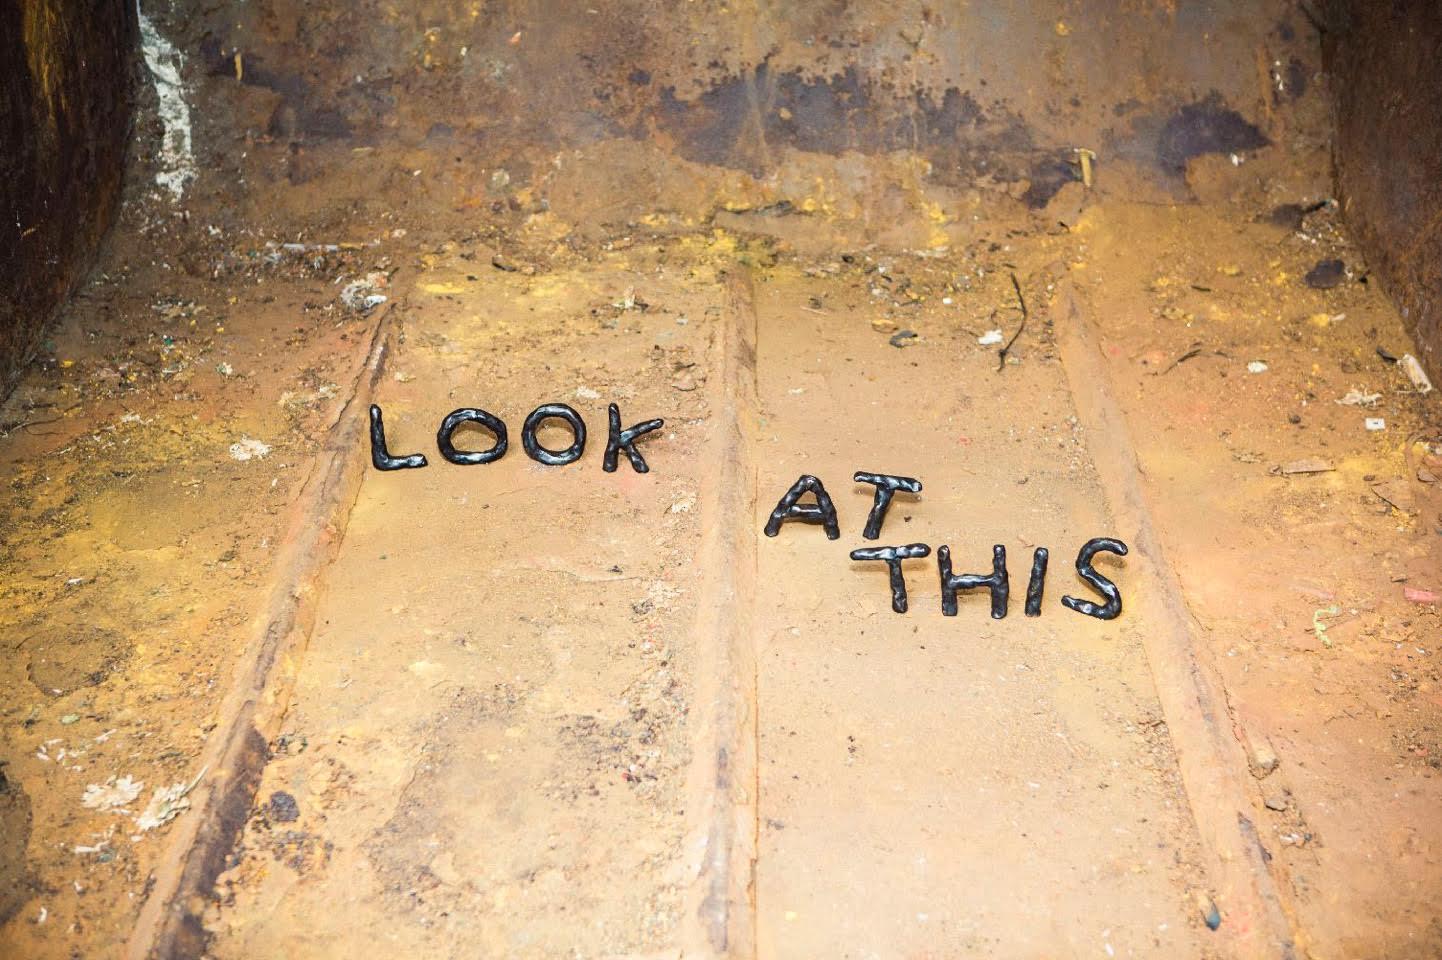 'Look at This' by David Shrigley